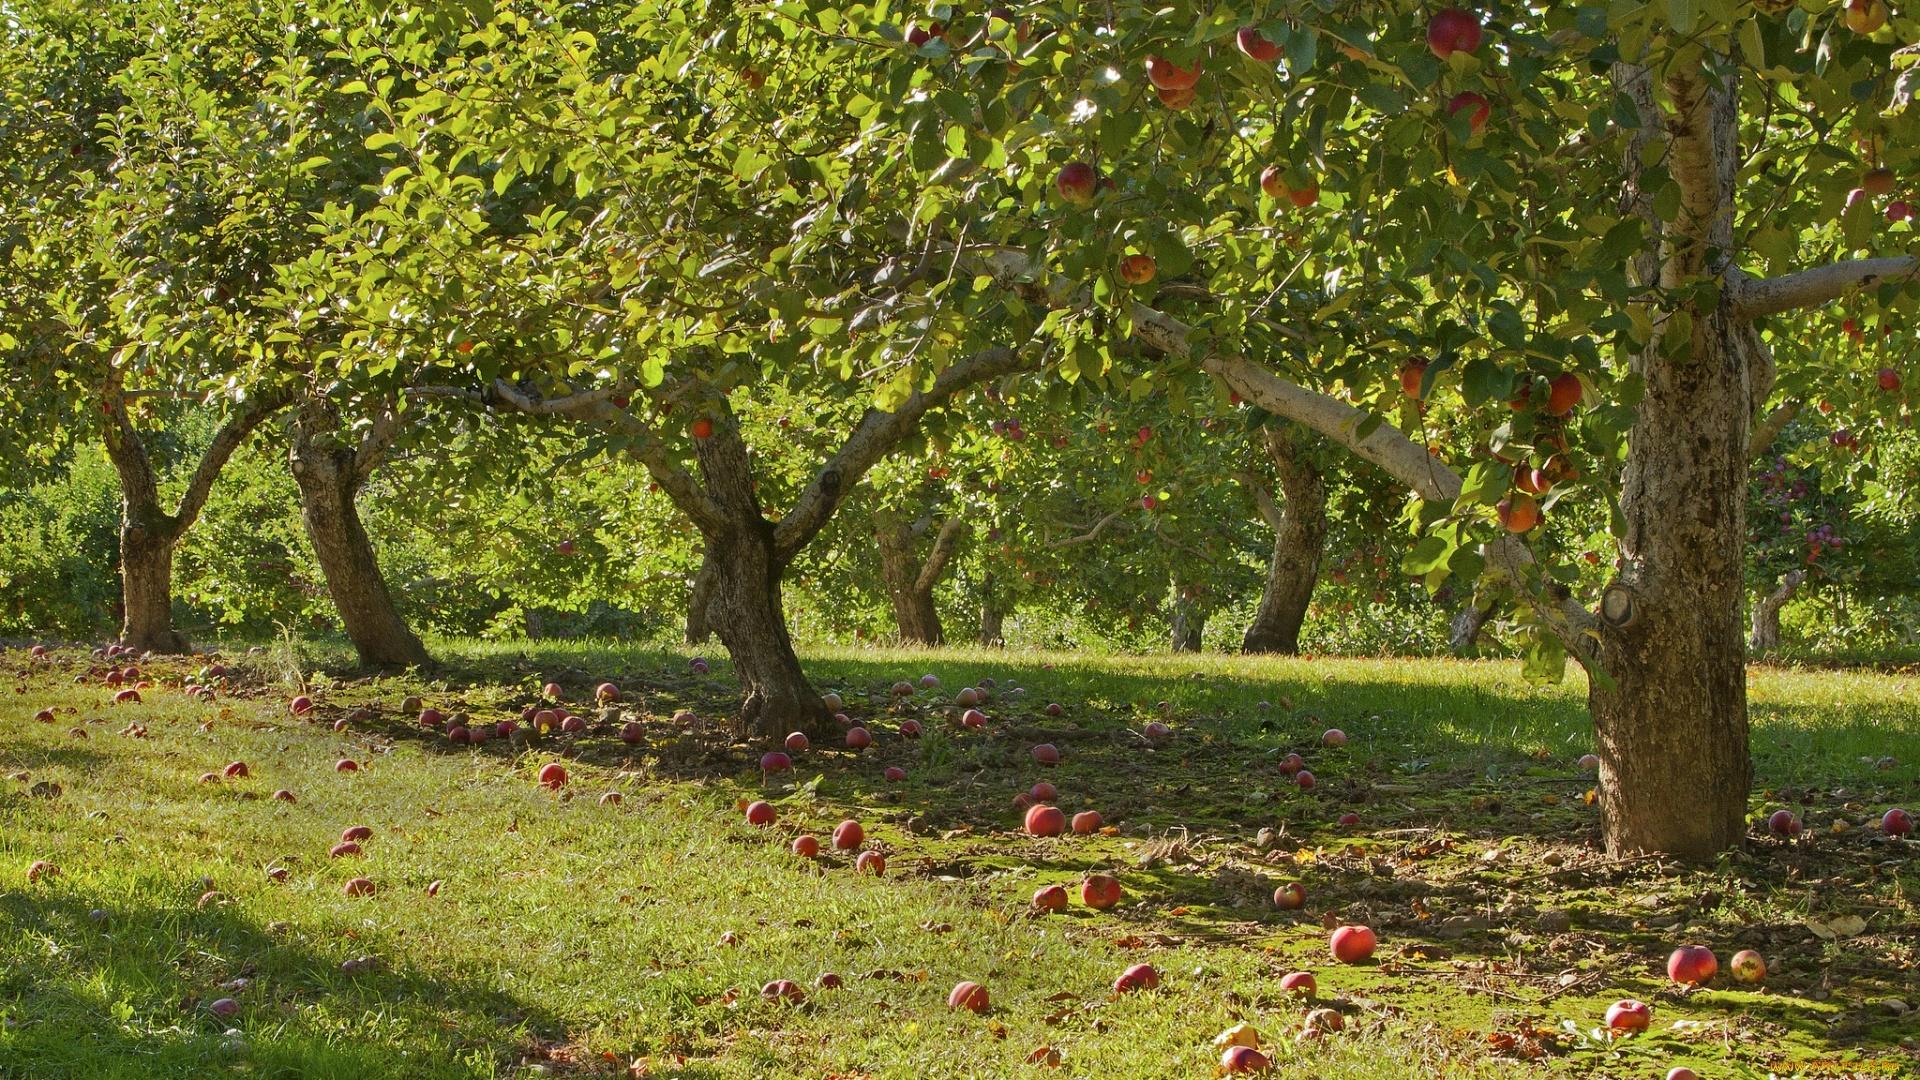 Apple Tree wallpaper for desktop